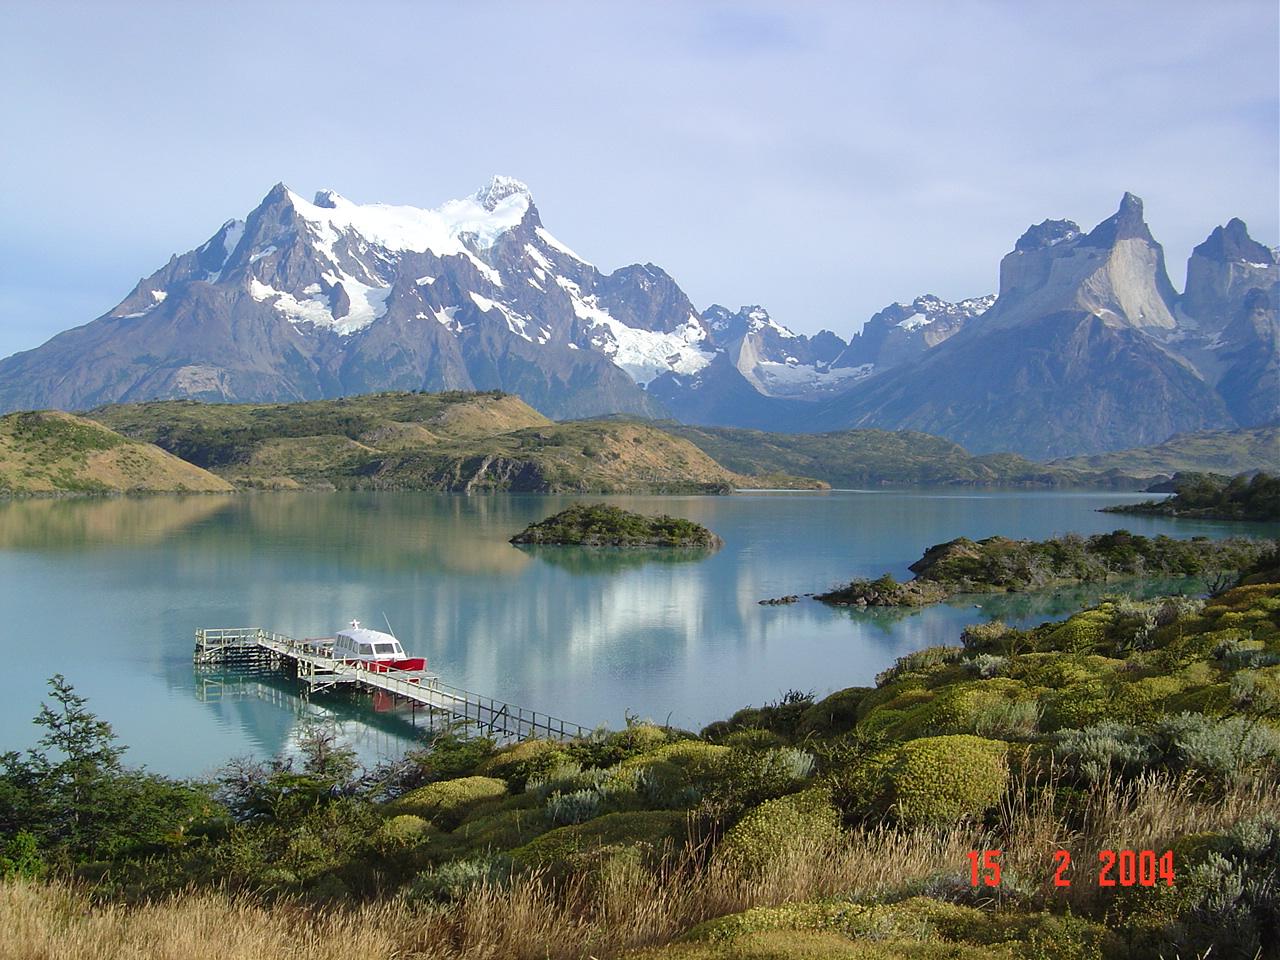 patagonia - photo #7